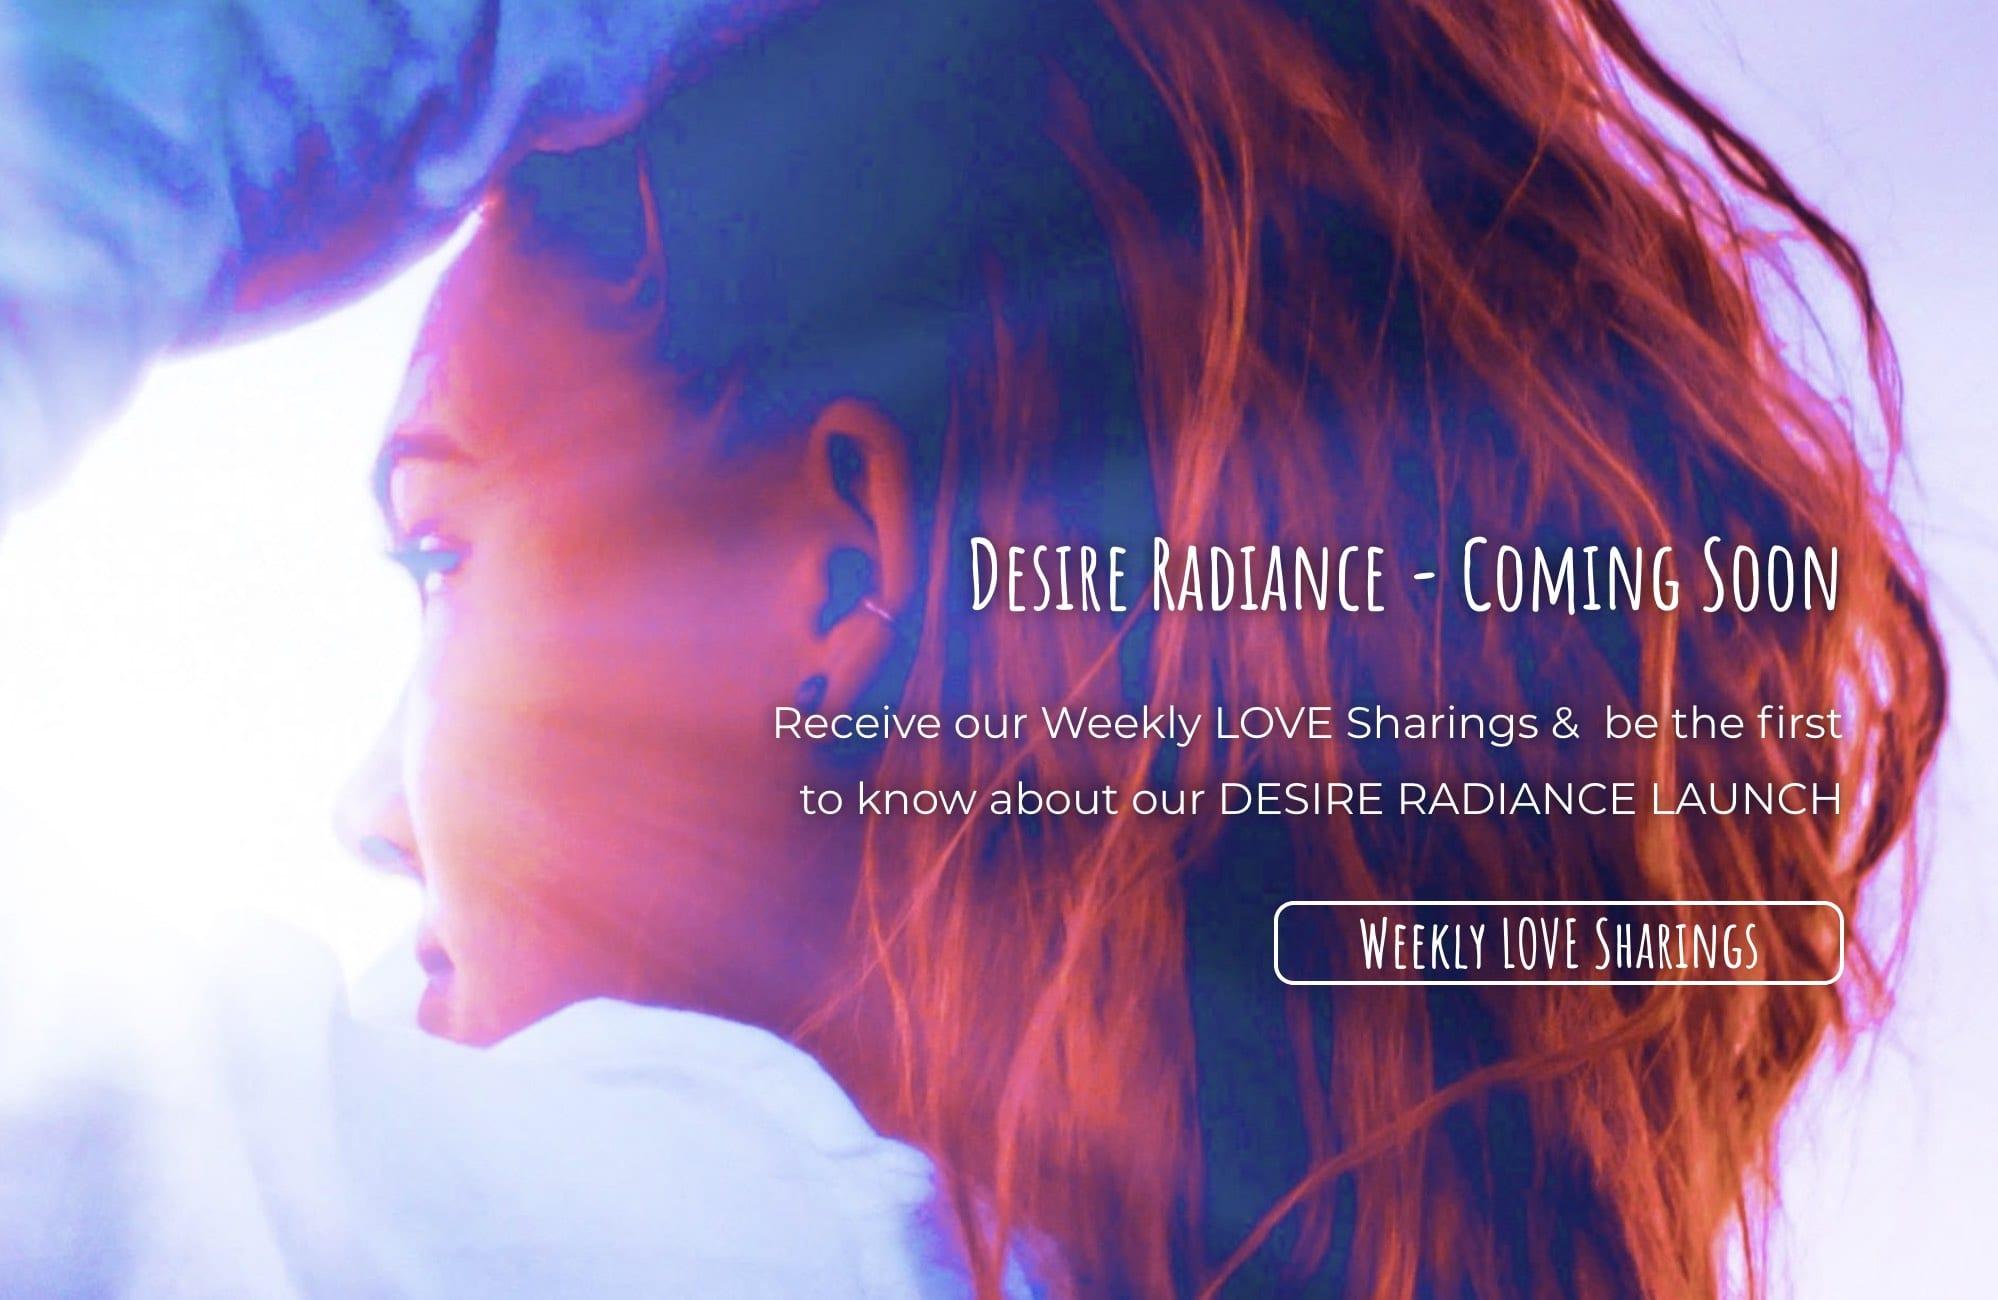 Desire-Radiance